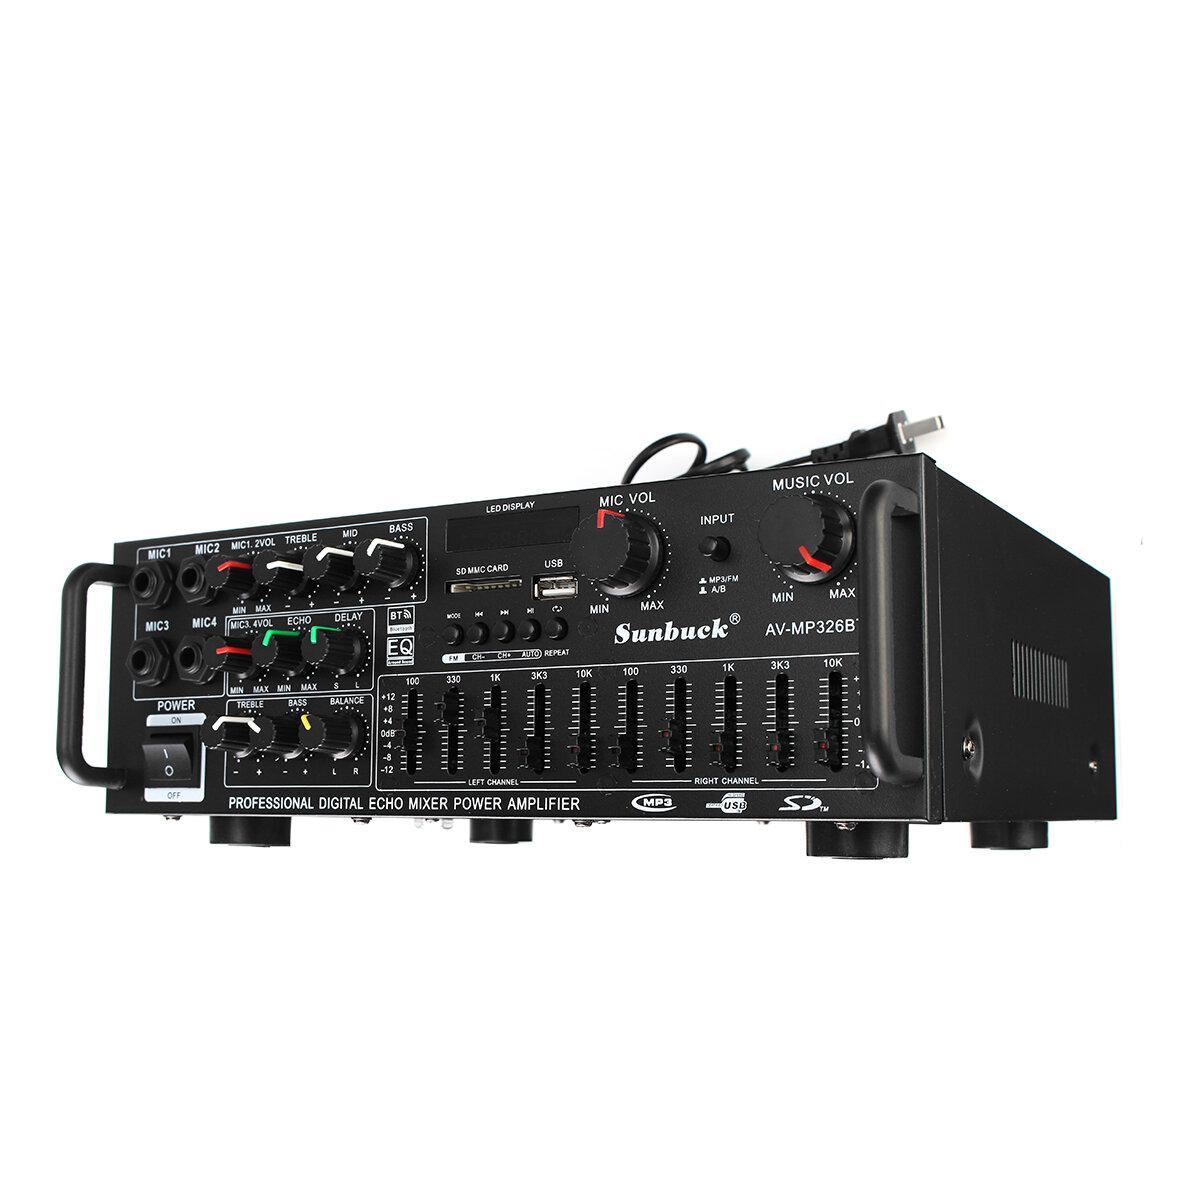 Sunbuck AV-MP326BT 220V 800W 4 ohm 2CH EQ bluetooth Stereo Amplifier Support USB Disk SD Card